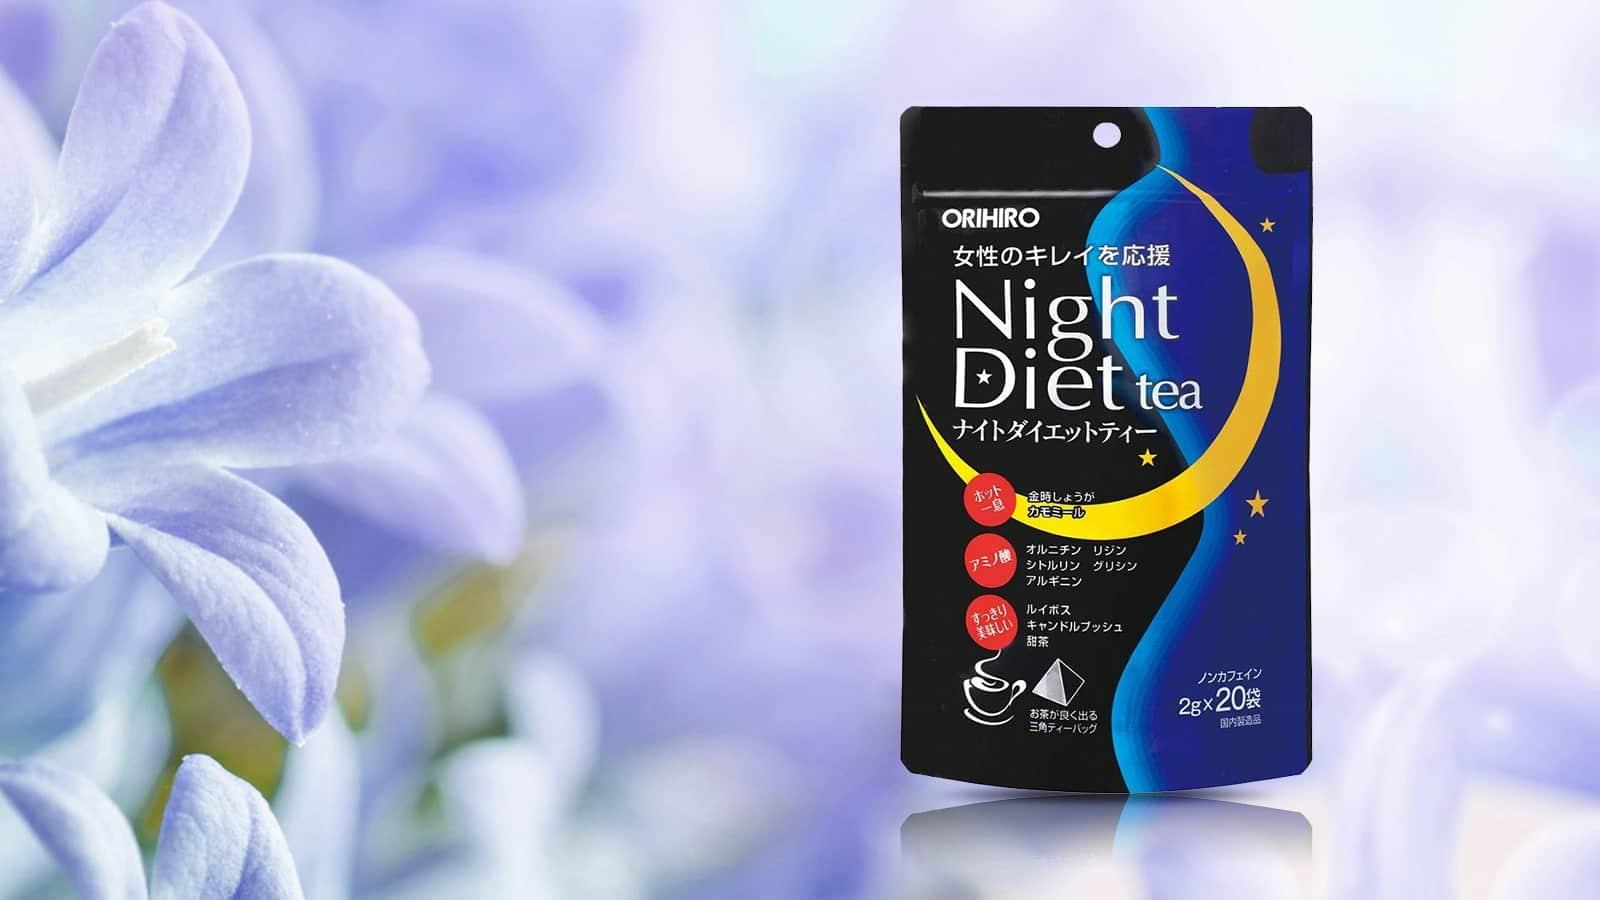 body-tra-giam-can-orihiro-night-diet-tea-nhat-ban-2g-x-20-goi-2558